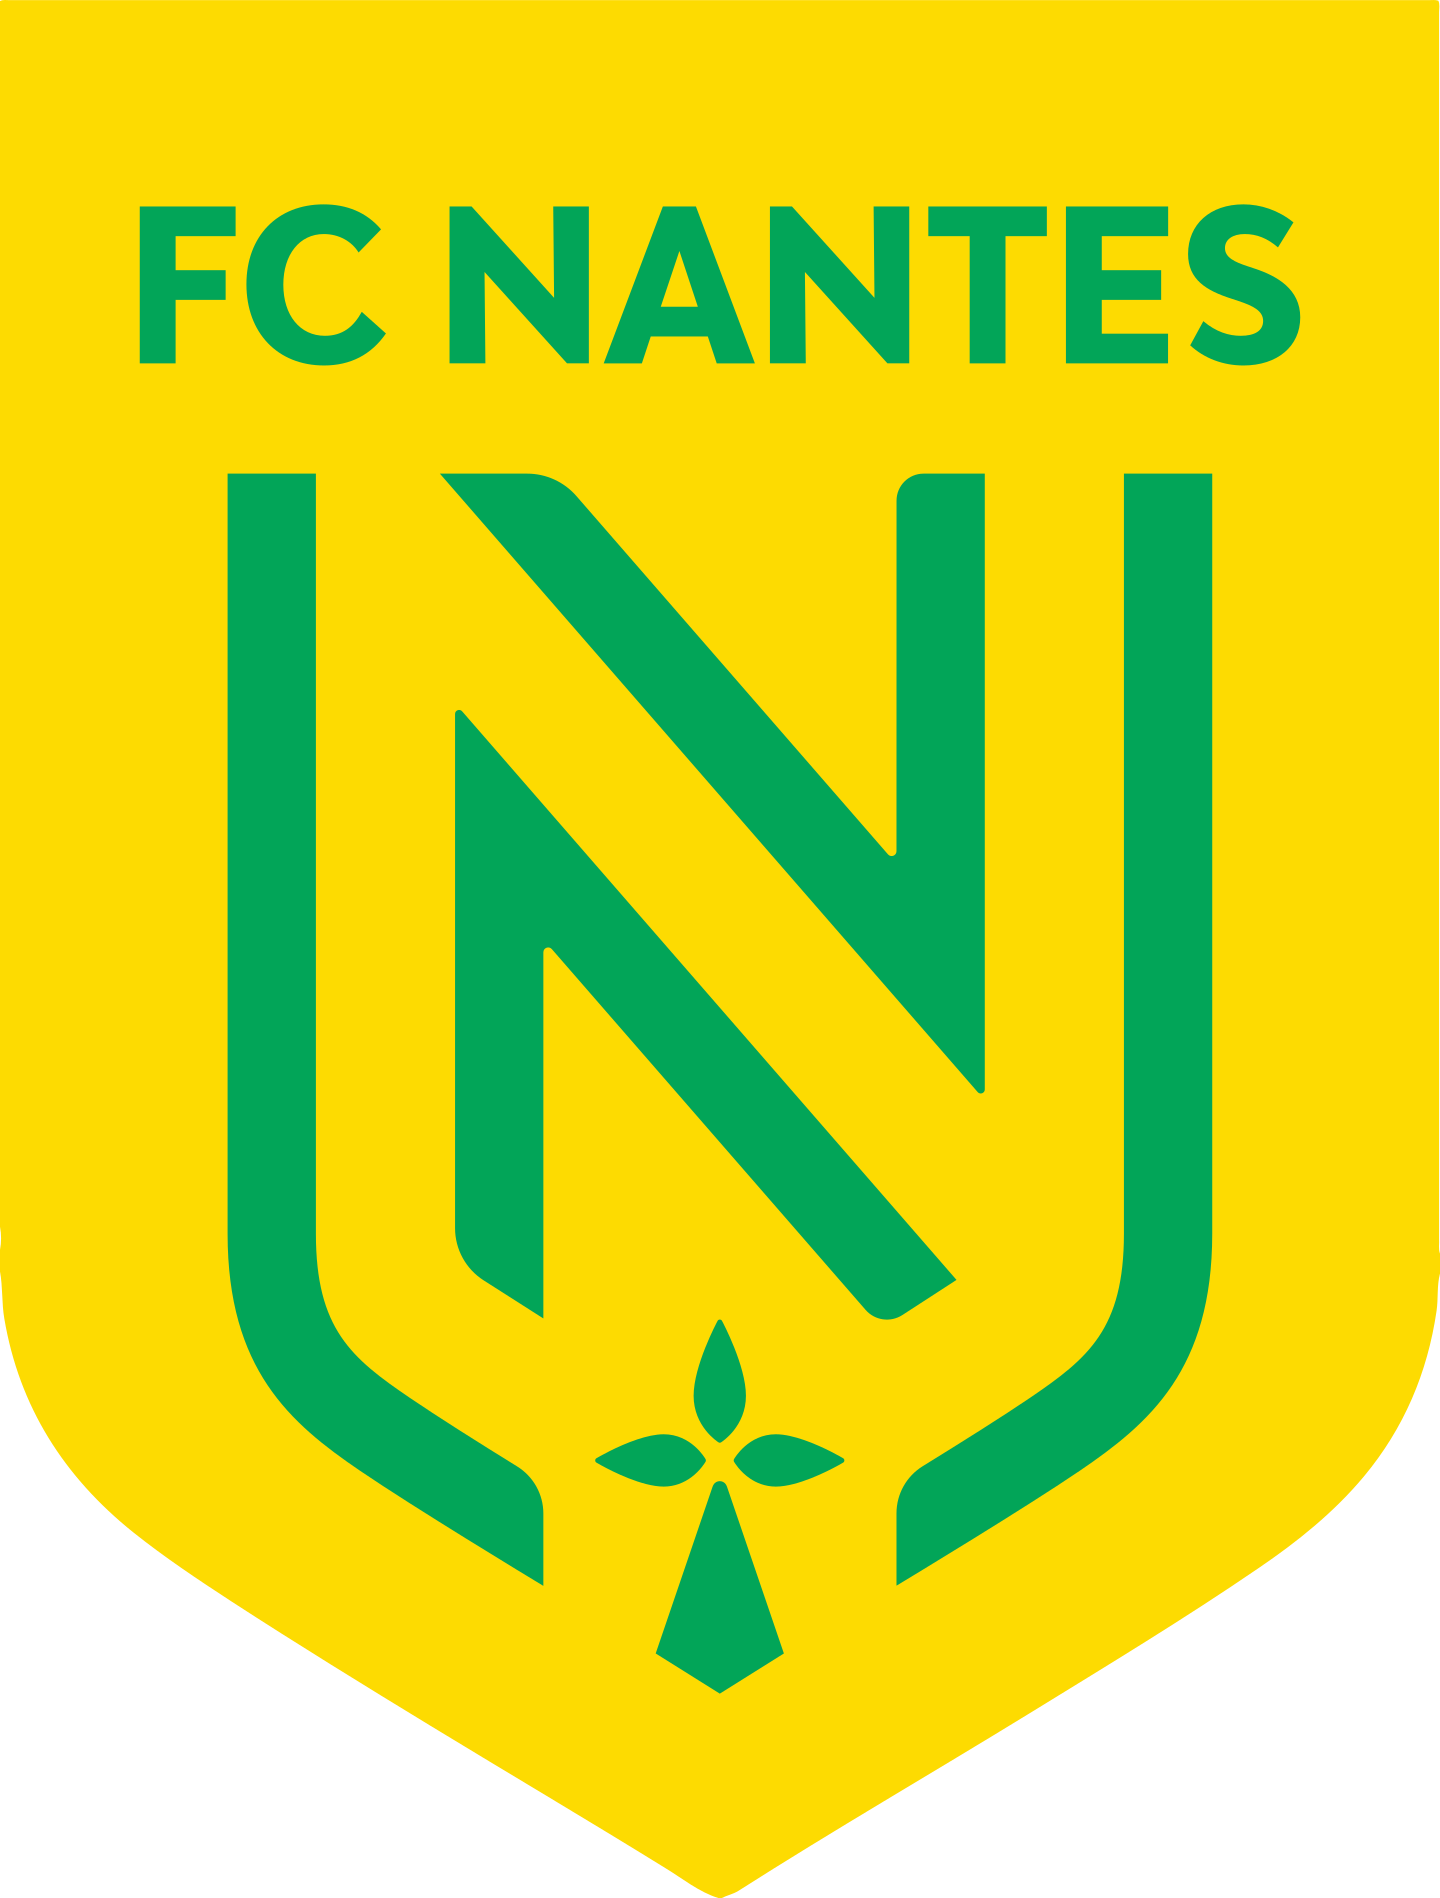 nantes fc logo 2 - FC Nantes Logo